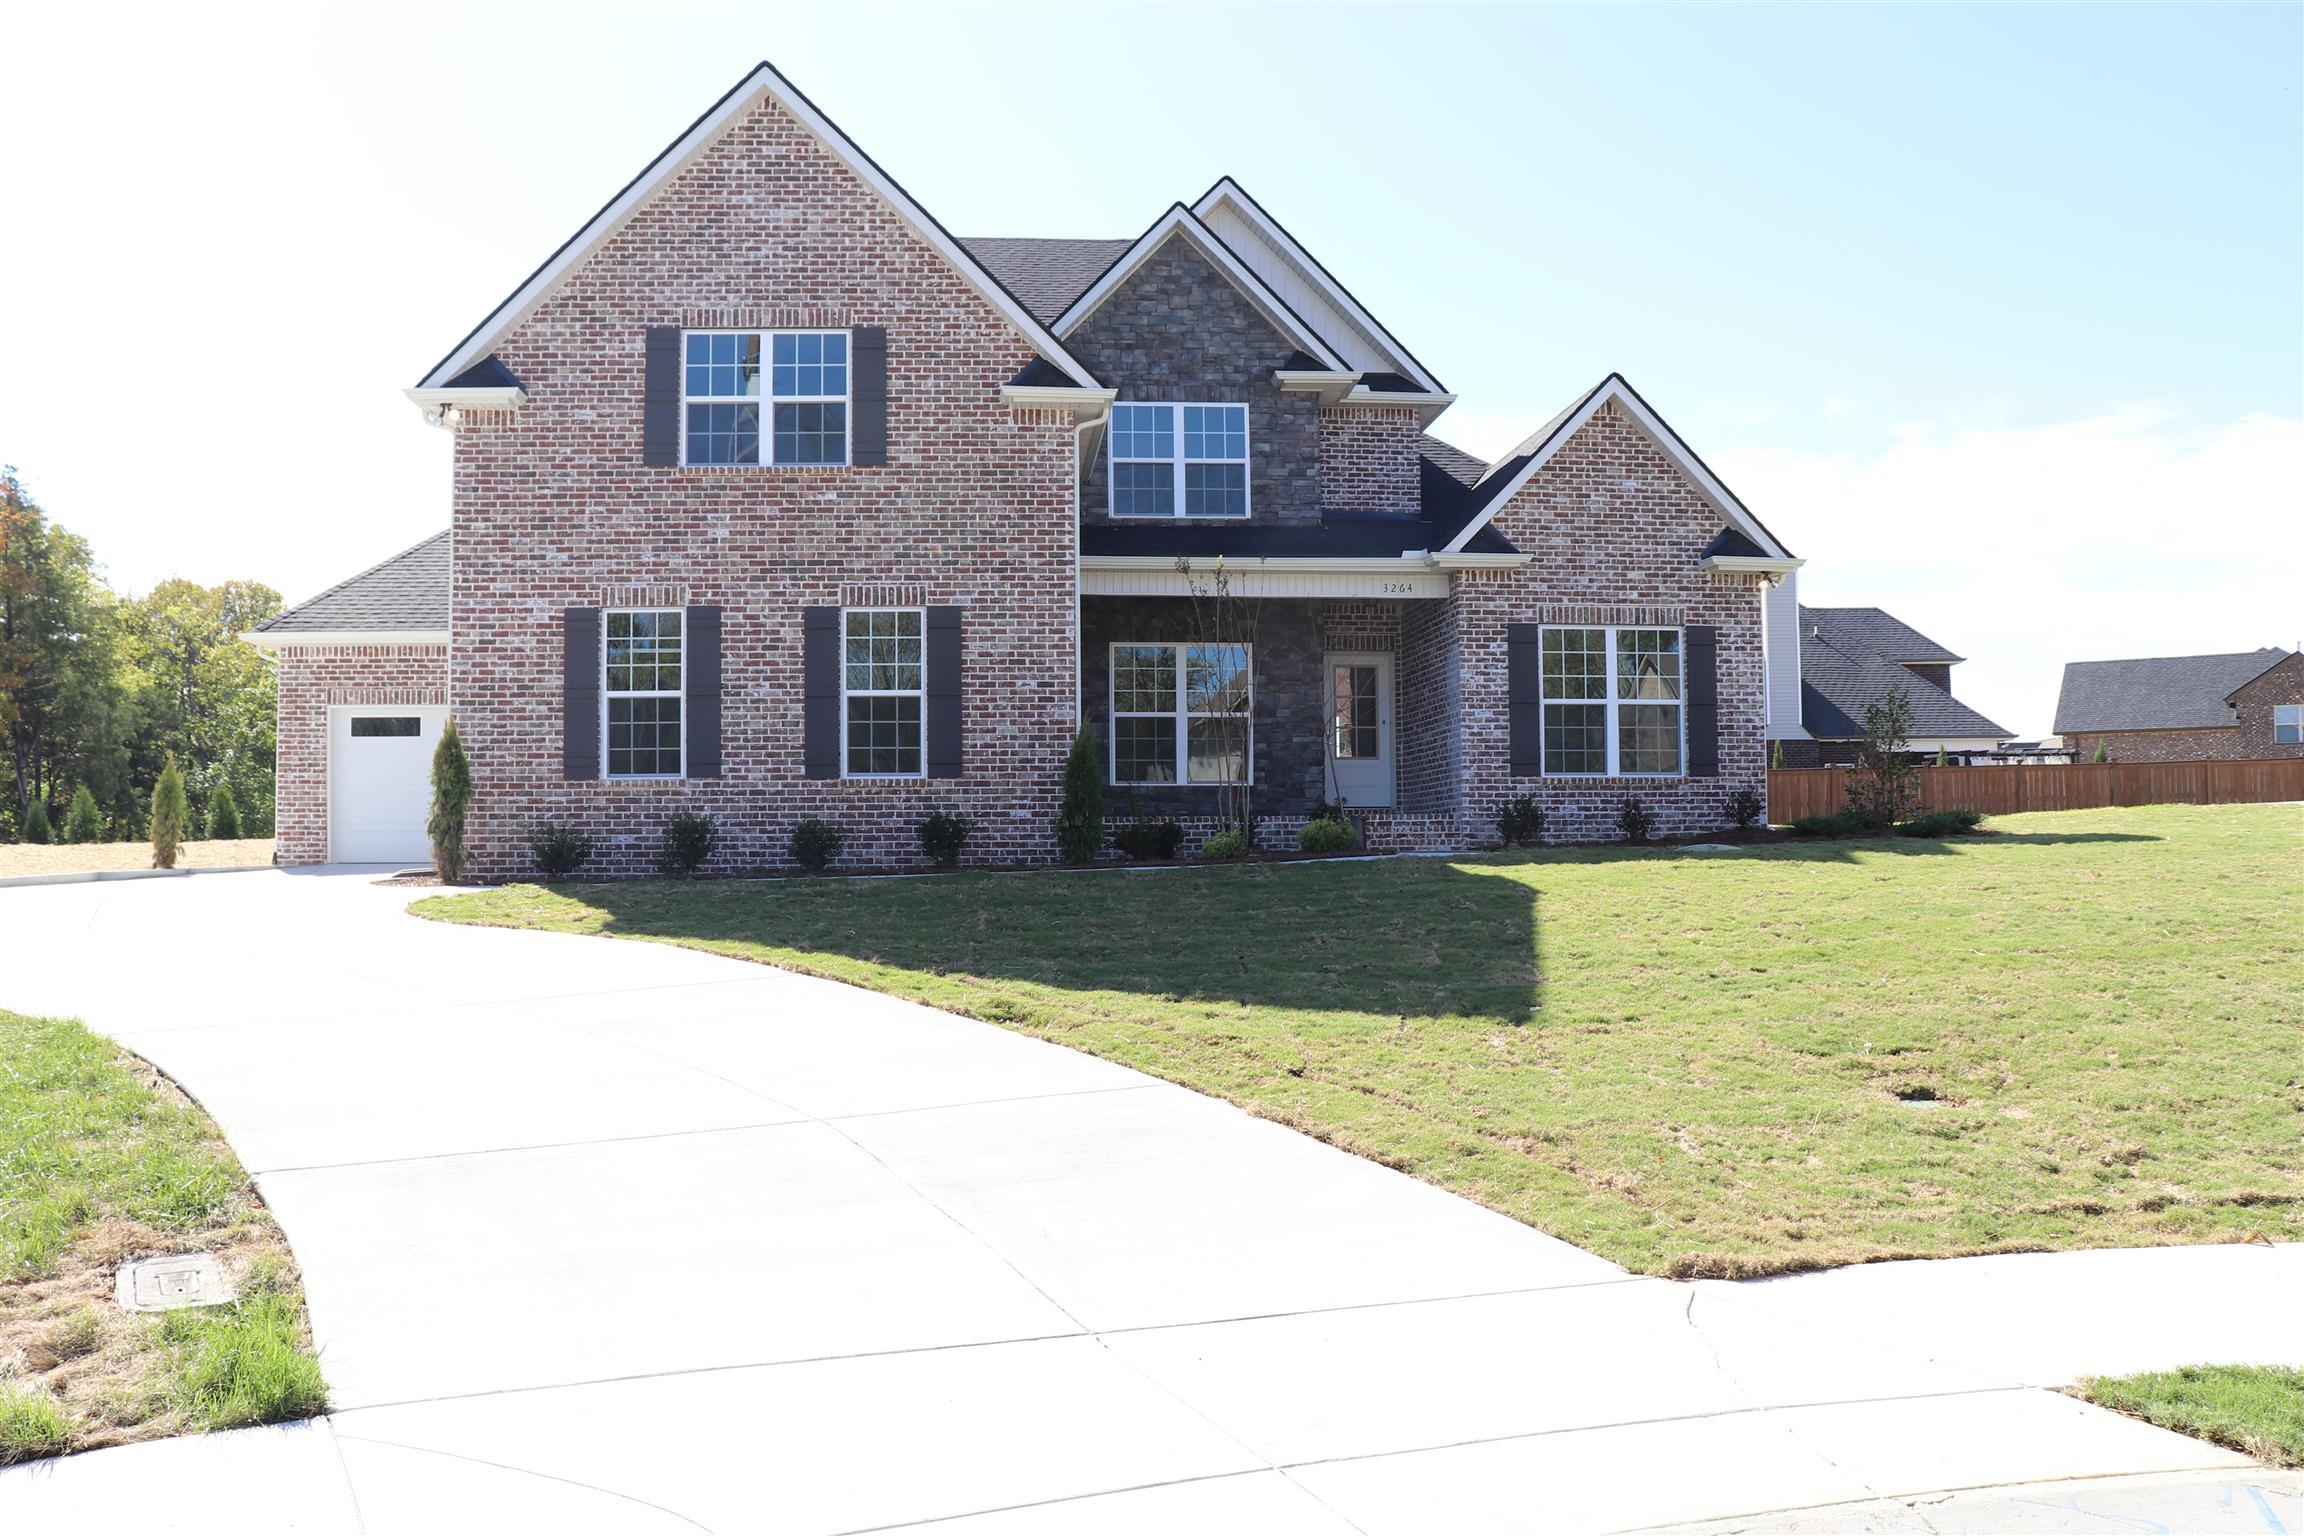 3264 Potts Xing, LA VERGNE, TN 37086 - LA VERGNE, TN real estate listing